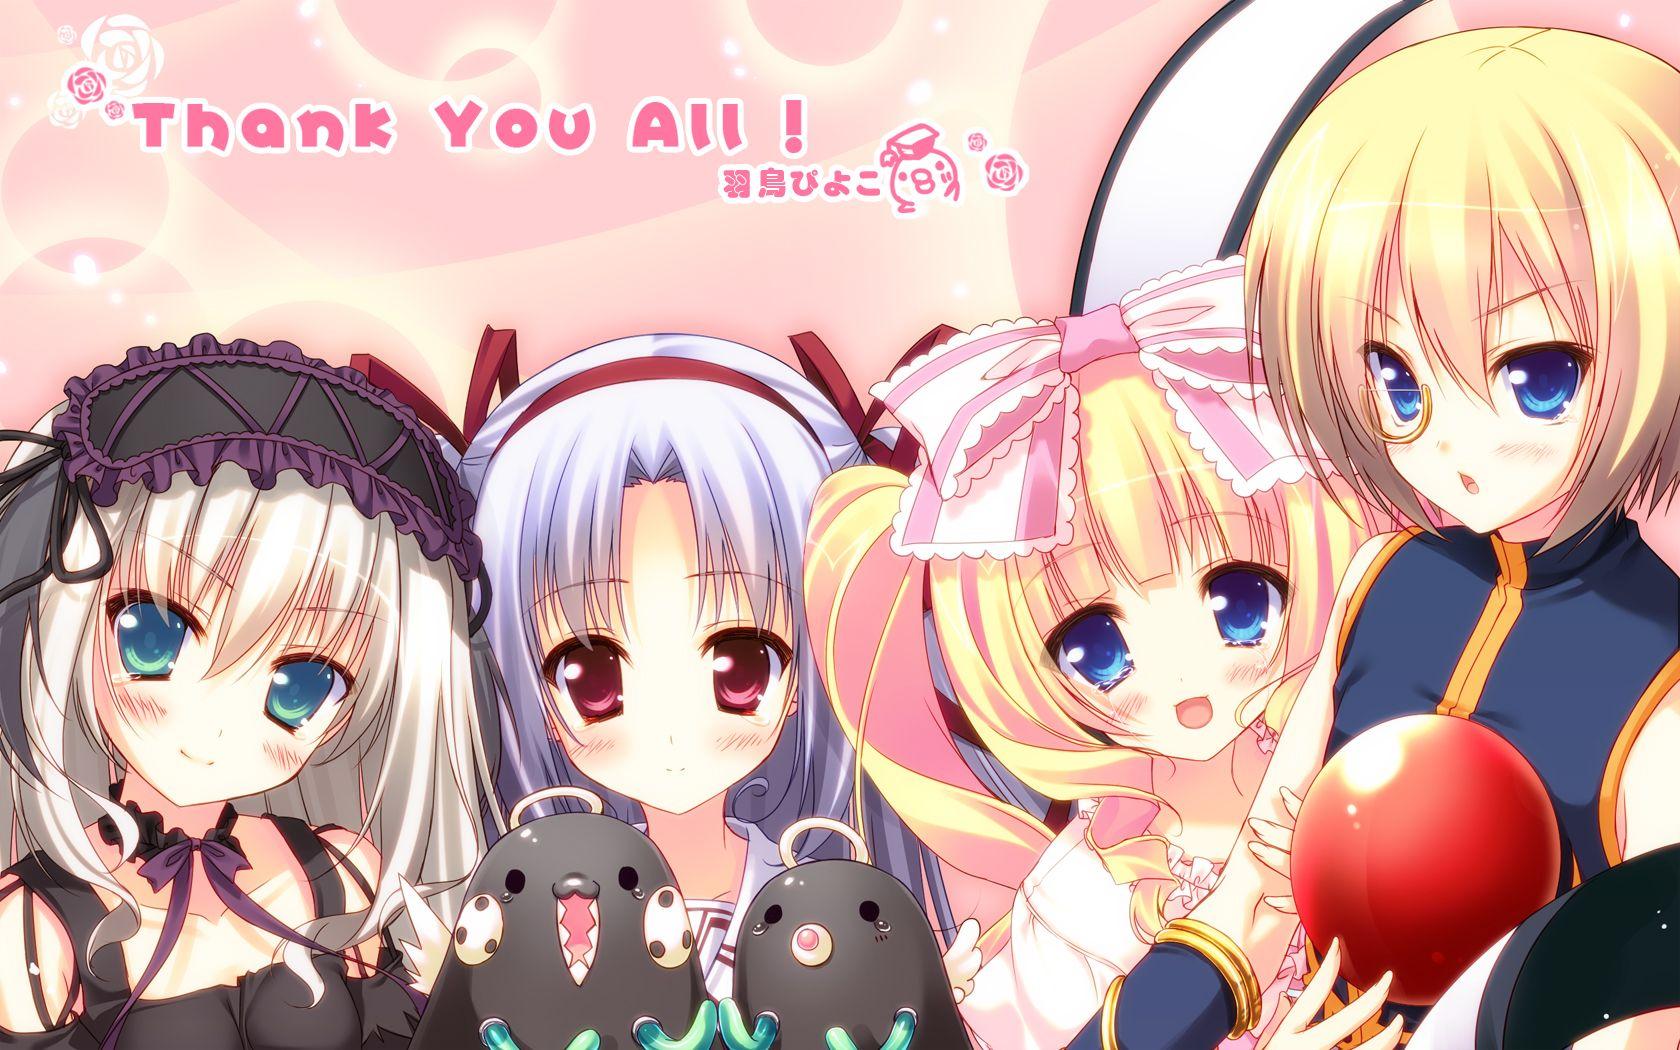 Tags 11eyes Momono Shiori Lass Hatori Piyoko Shokan No Scholastica Shokan No Benedictus Lieselotte Werckmeister Anime Wallpaper Anime Android Wallpaper